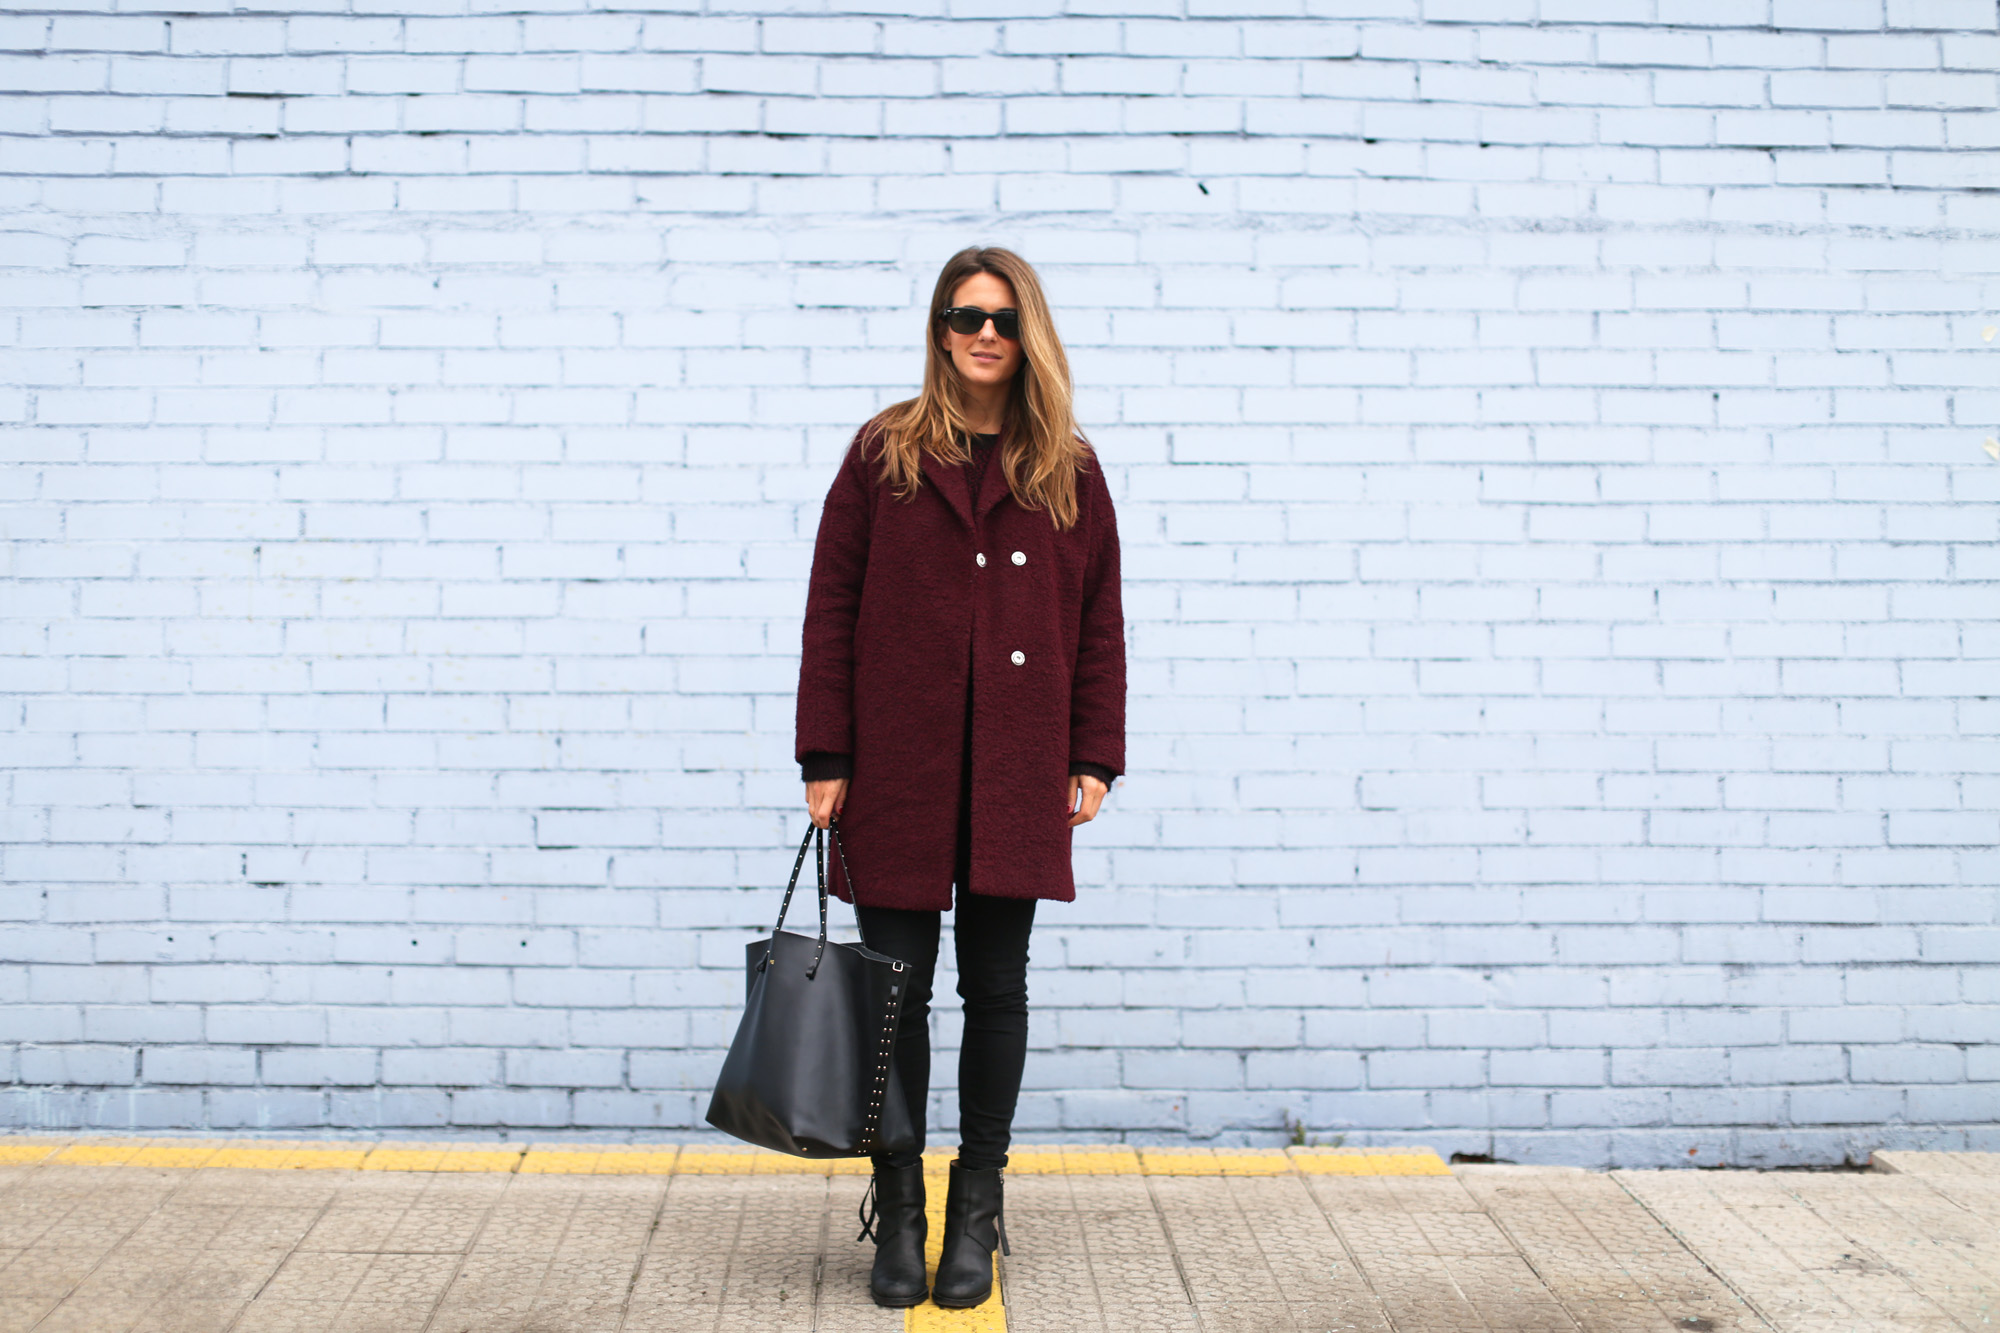 Clochet_streetstyle_burgundy_wool_coat_acne_studios_pistol_boots